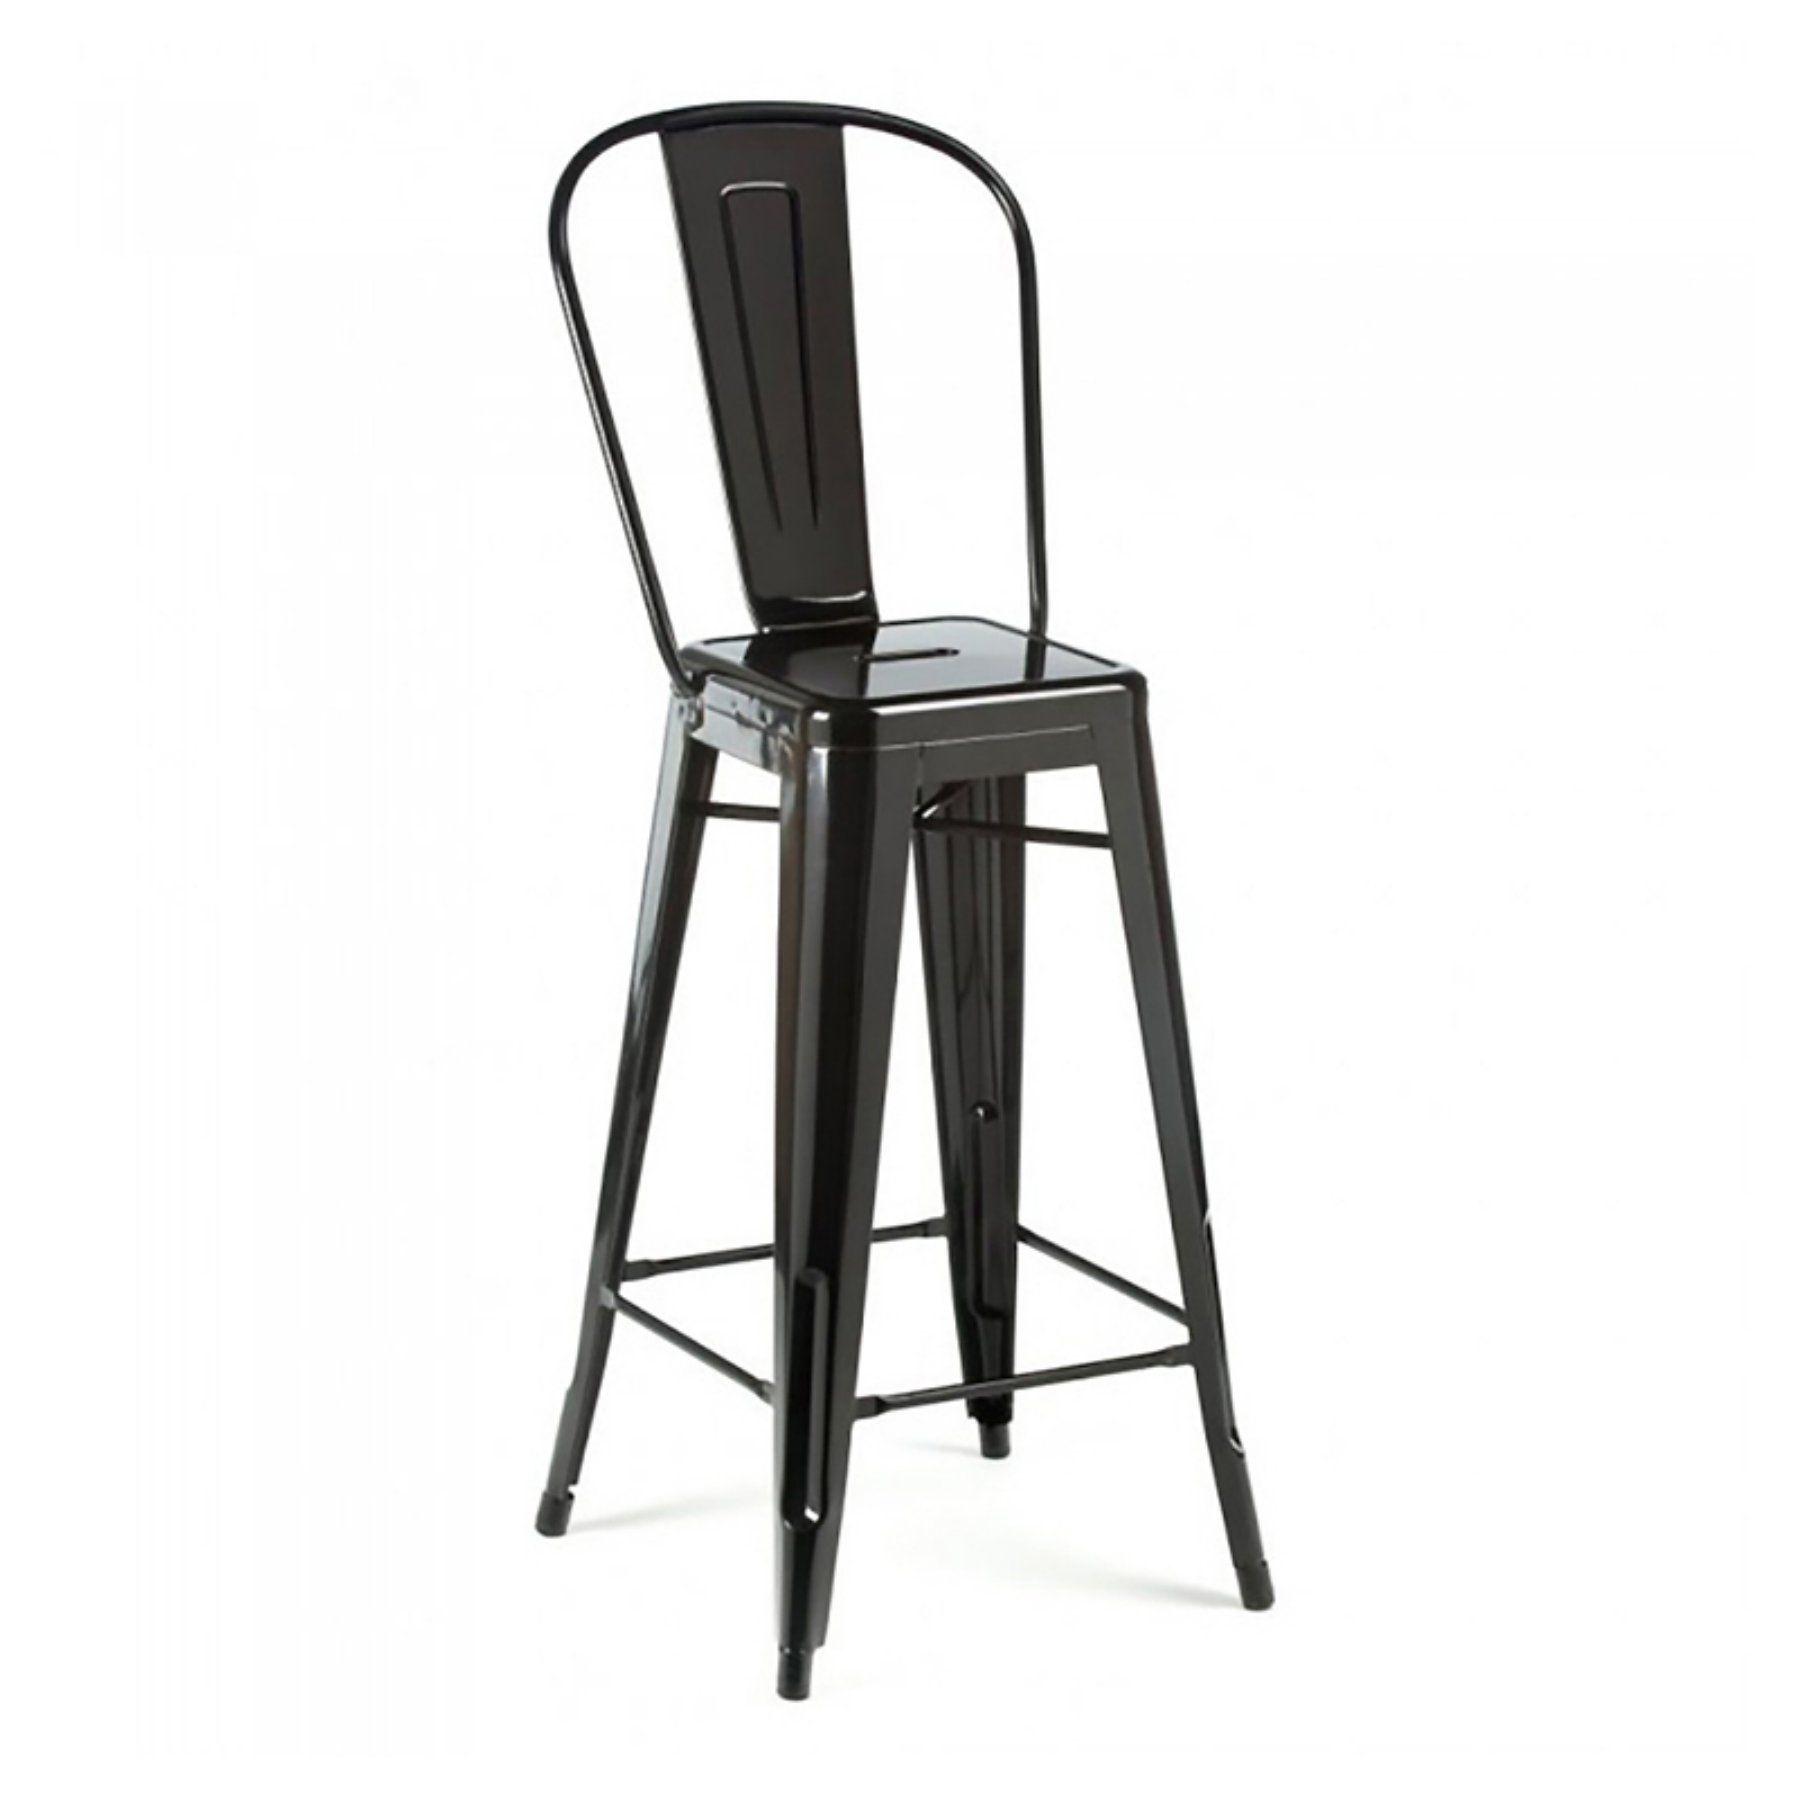 Pleasing Design Lab Mn Dreux High Back Barstool Set Of 4 Ls 9100 Andrewgaddart Wooden Chair Designs For Living Room Andrewgaddartcom